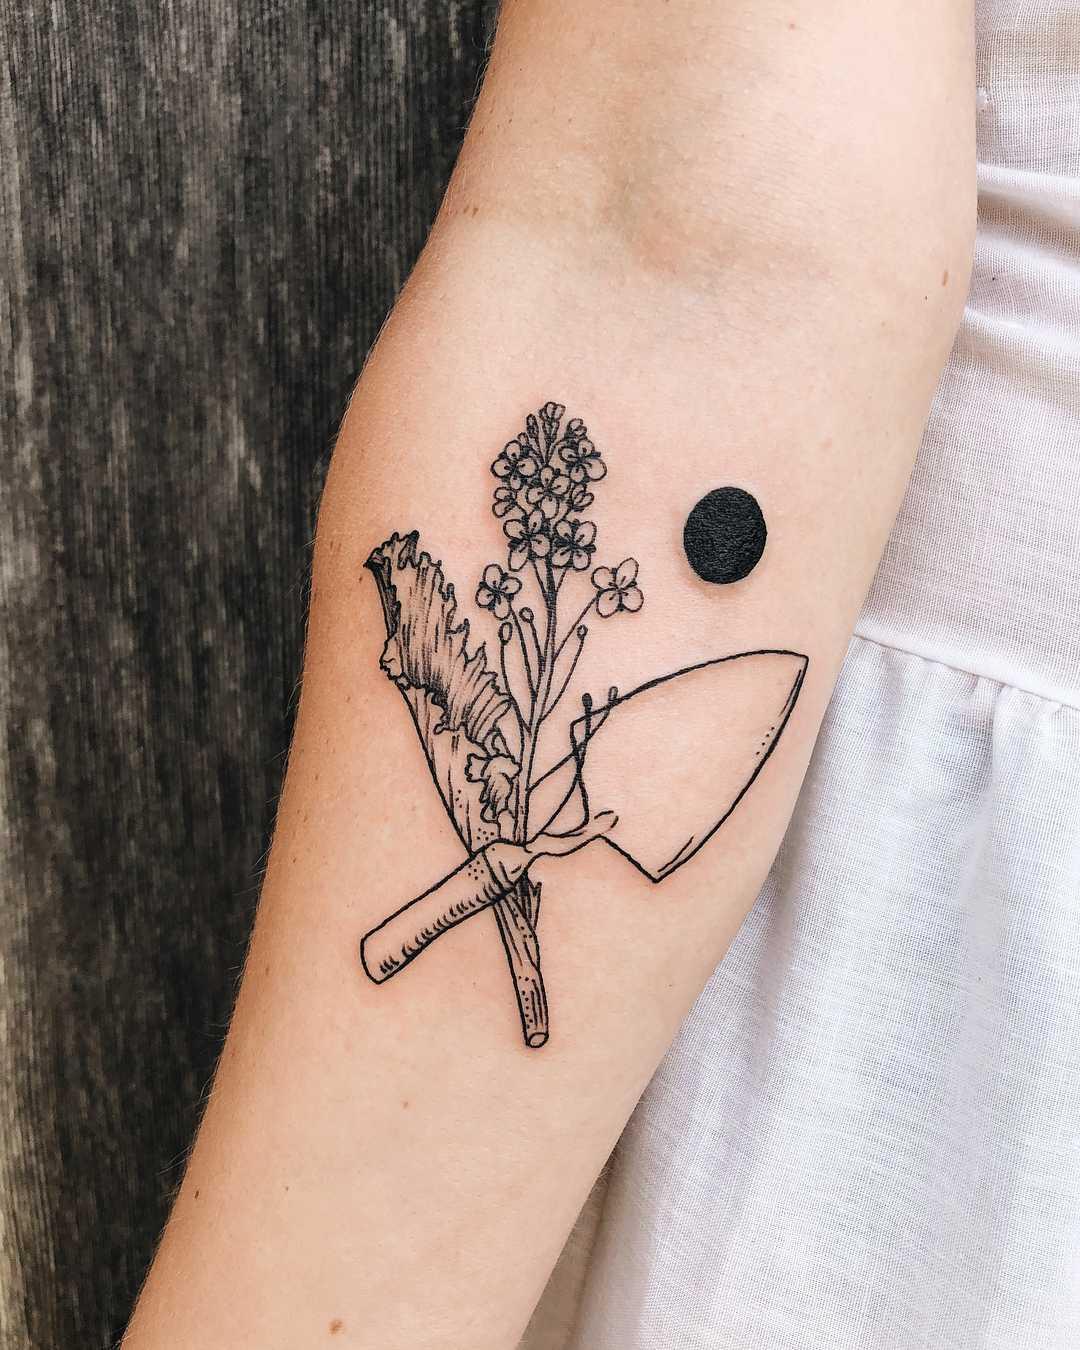 Tattoo for gardening maniac